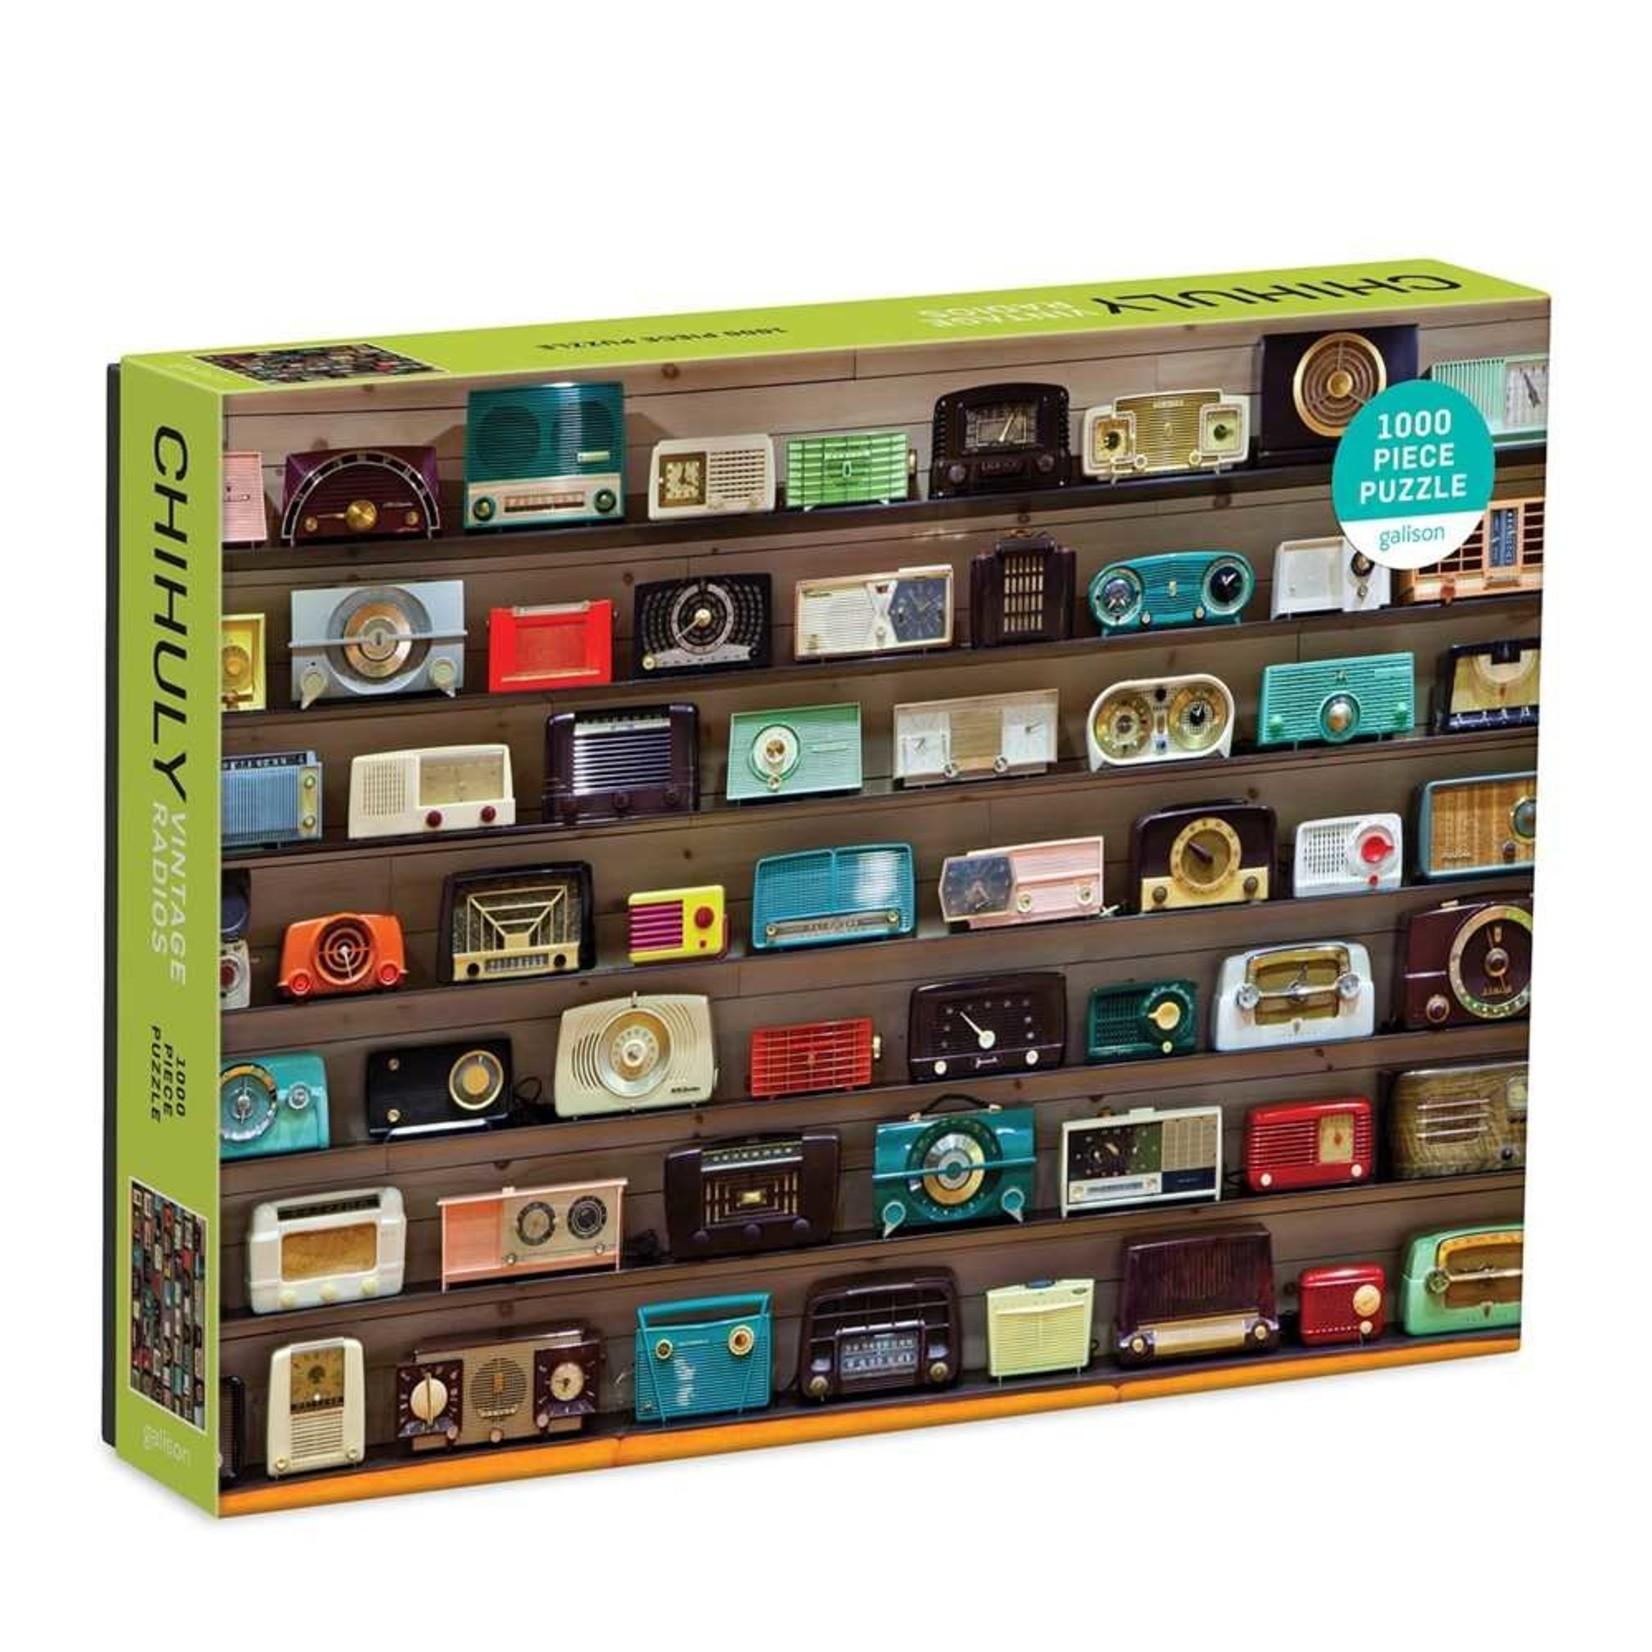 Galison Vintage Radios Chihuly 1000pc